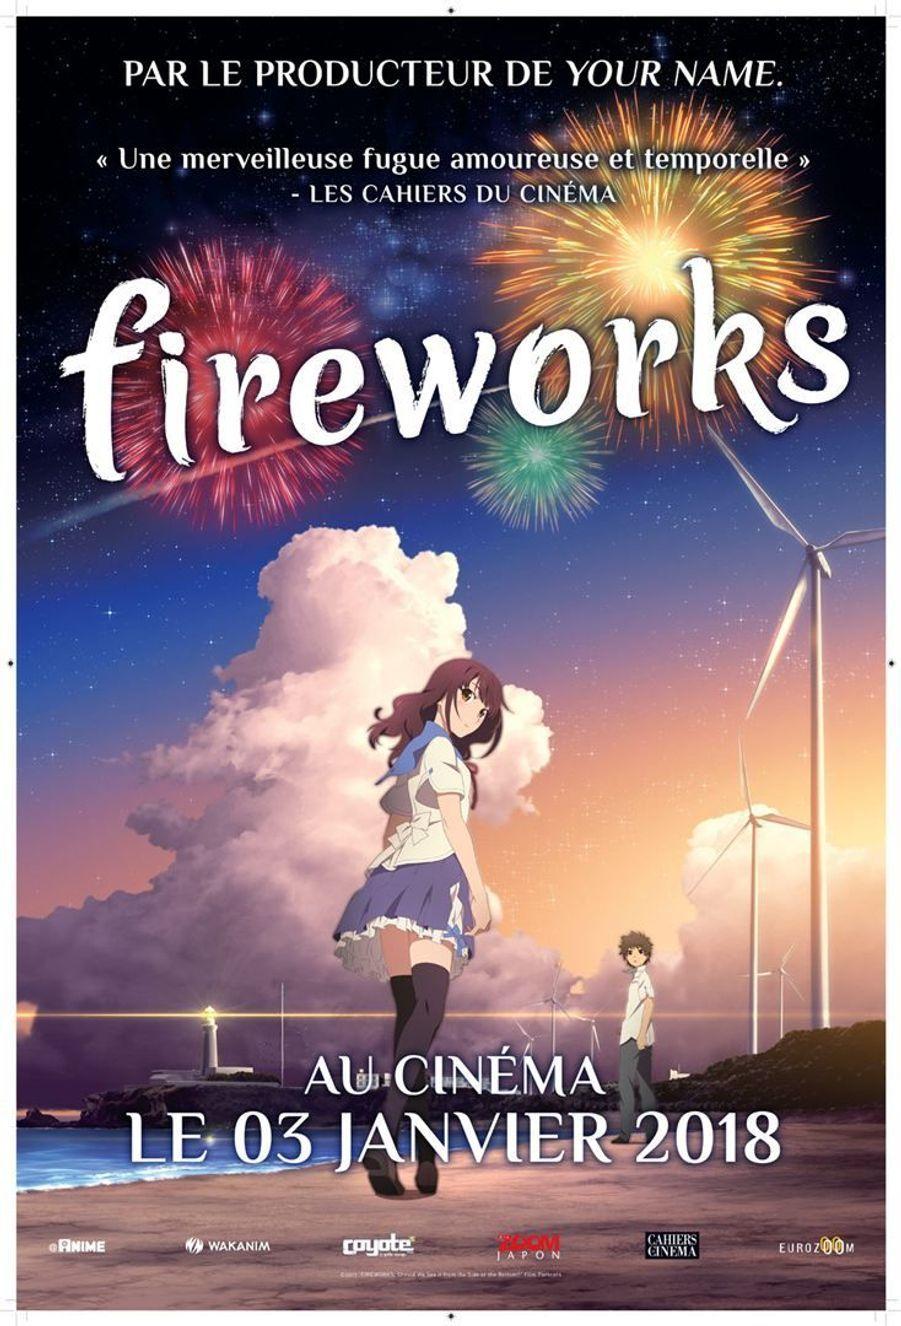 Fireworksde Akiyuki Shinbo et Nobuyuki Takeuchi (sortie le 3 janvier)